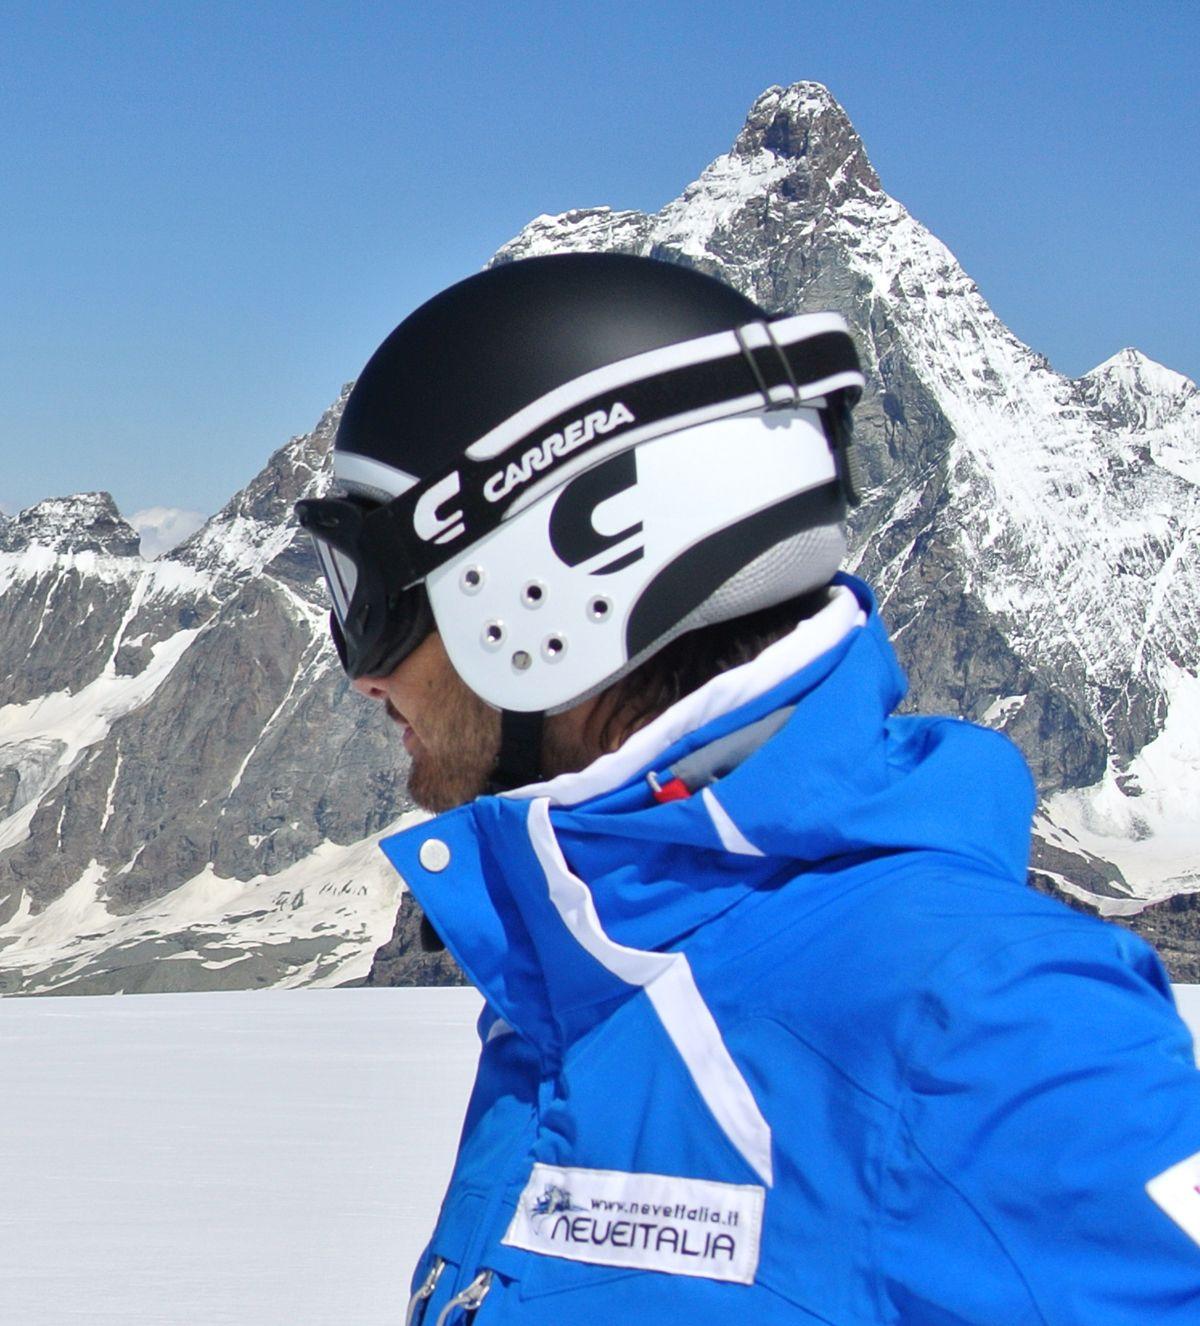 Ski Test Neveitalia al Plateau Rosà a Cervinia